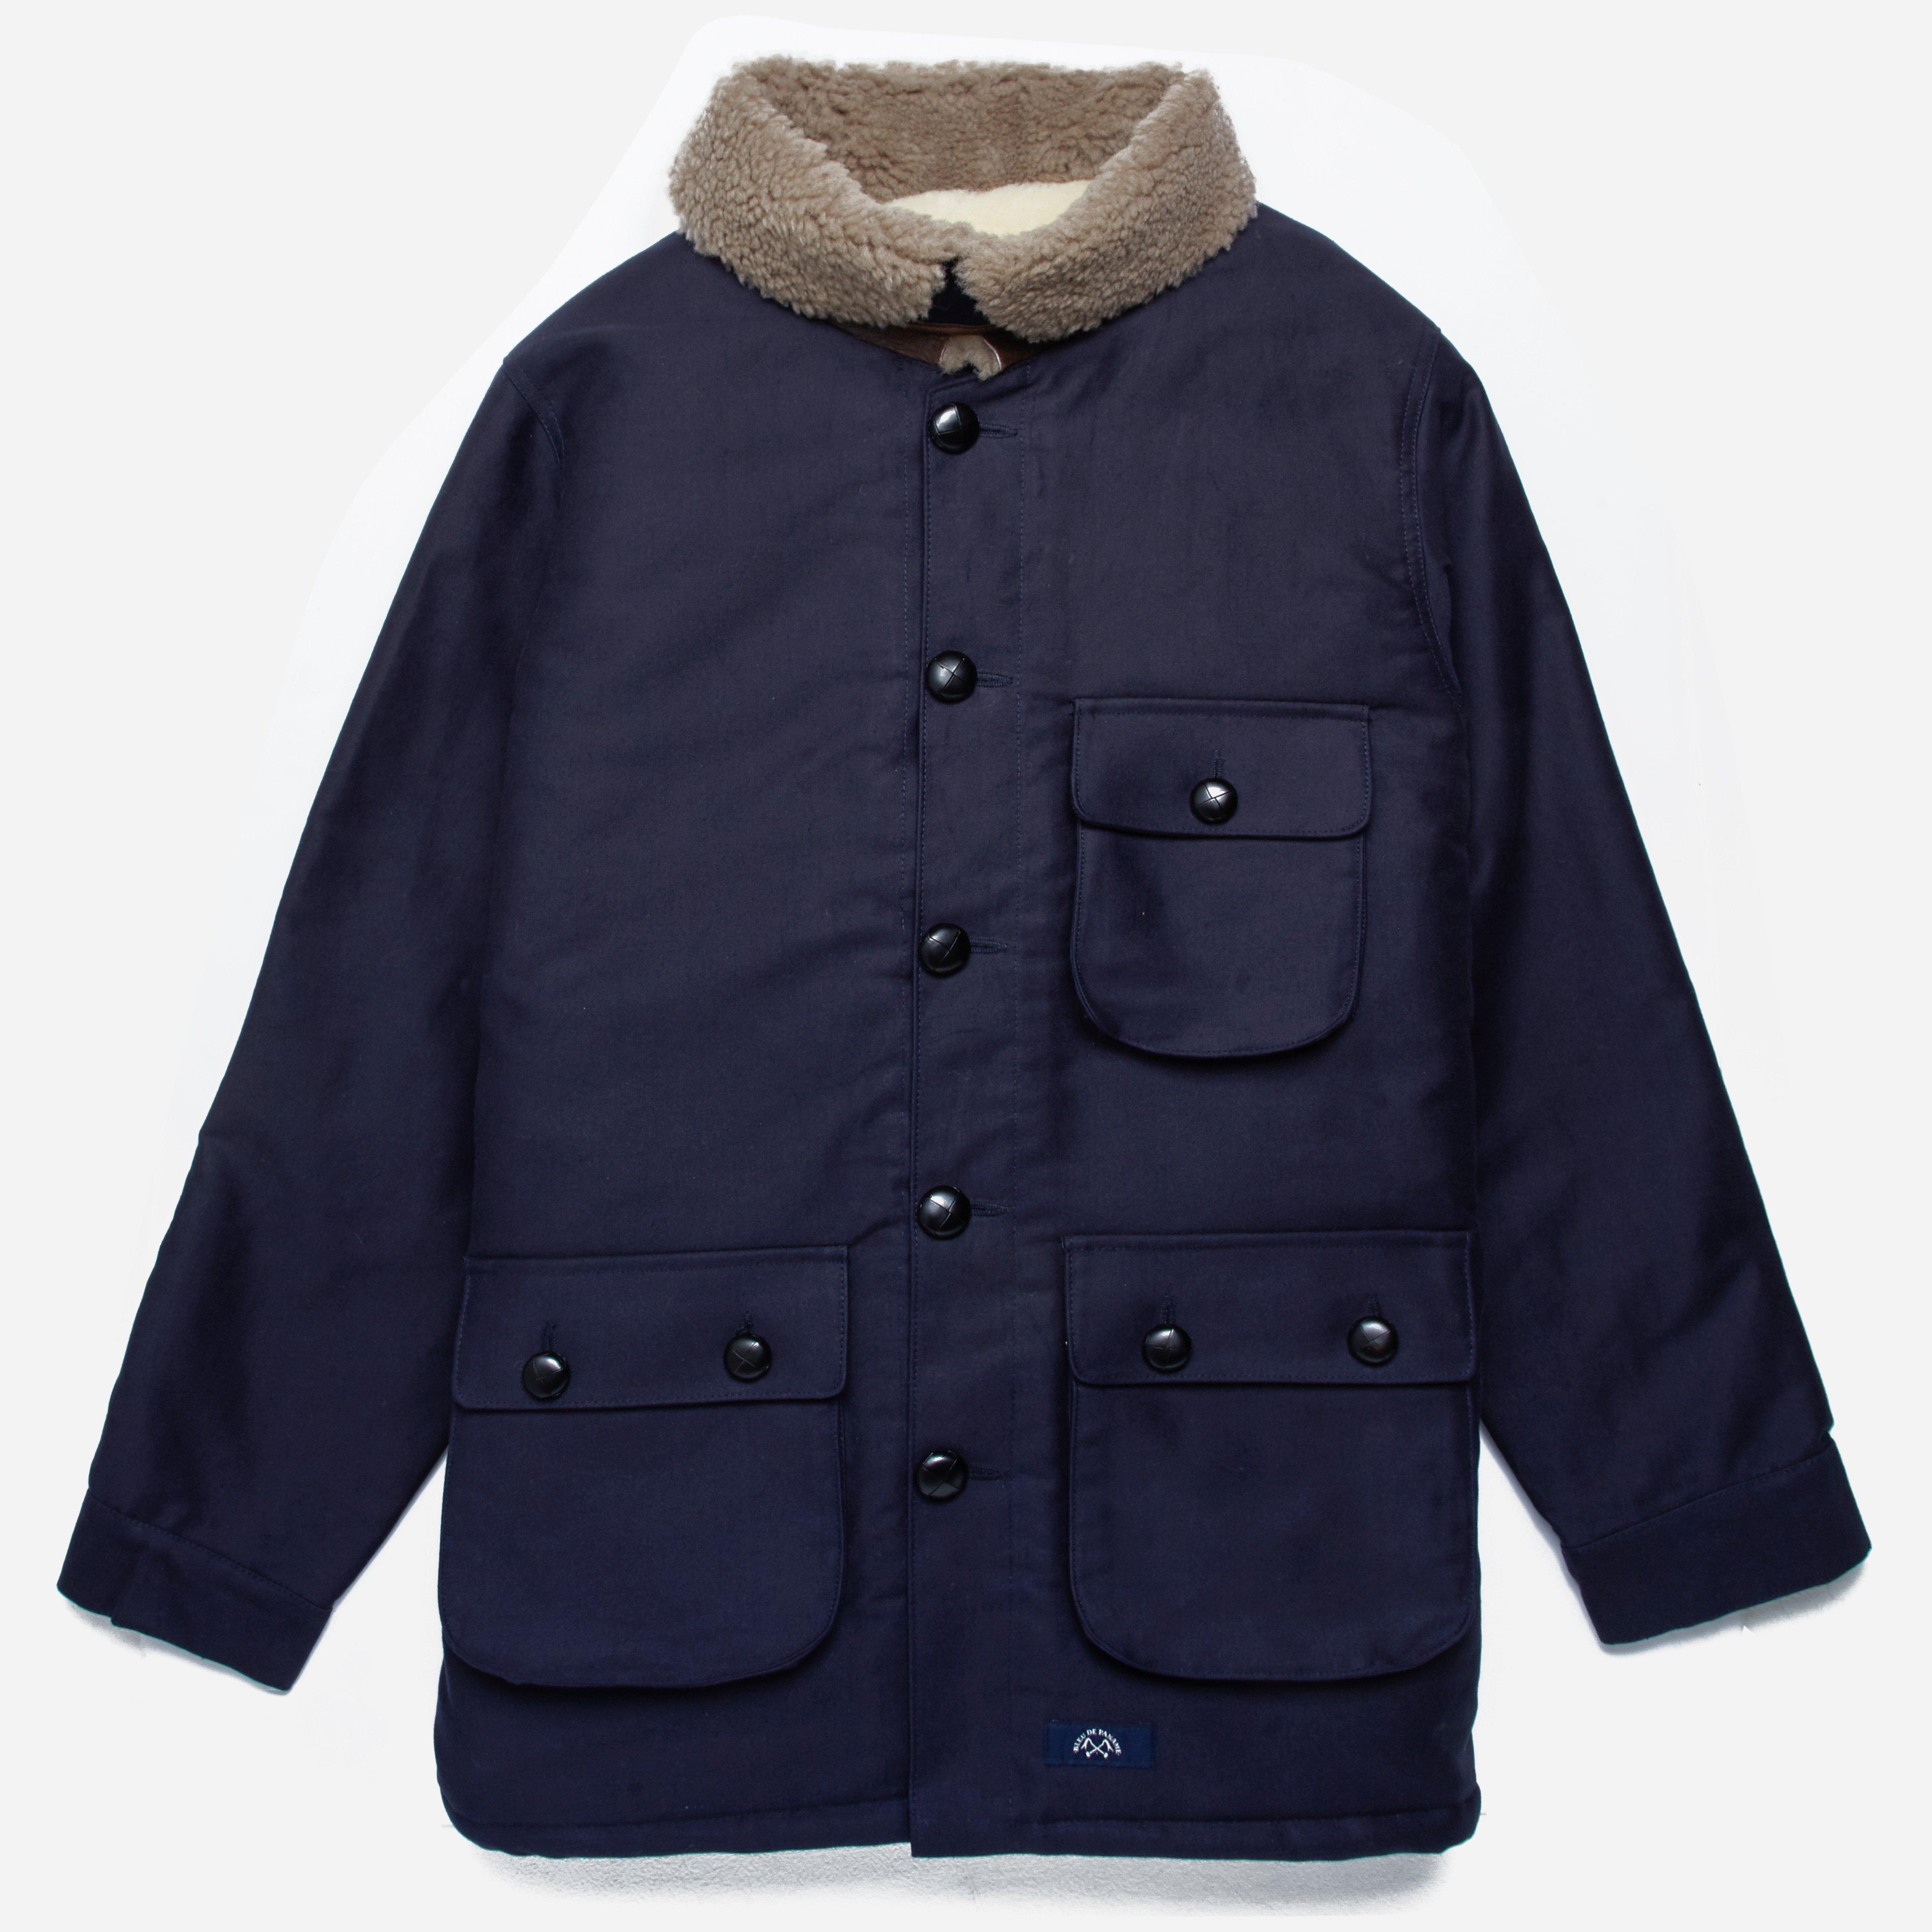 Bleu De Paname Double Counter Jacket